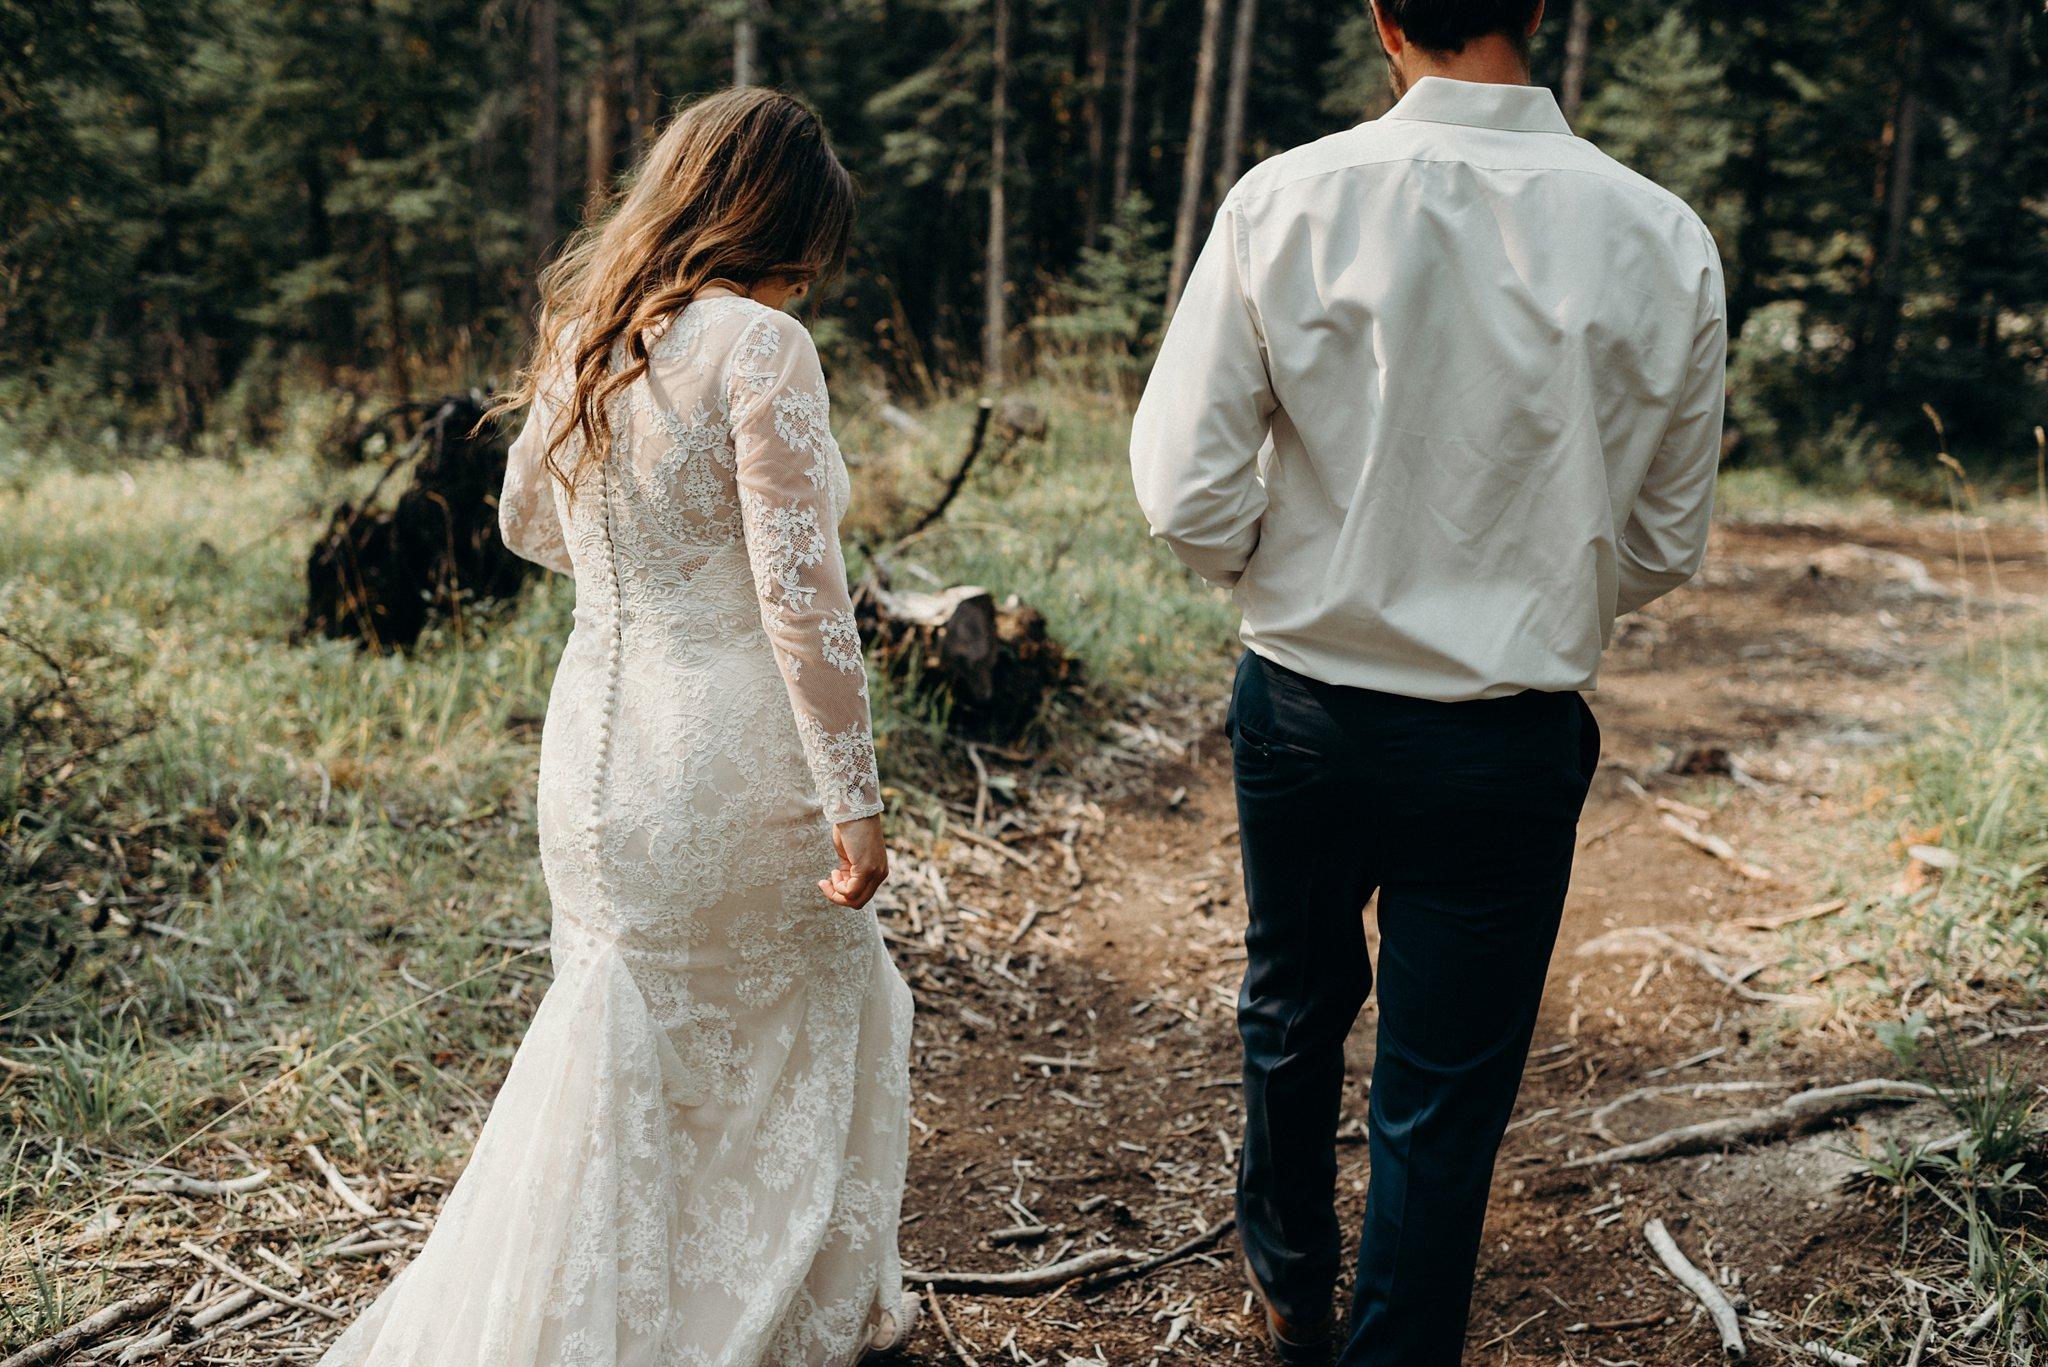 kaihla_tonai_intimate_wedding_elopement_photographer_6715.jpg